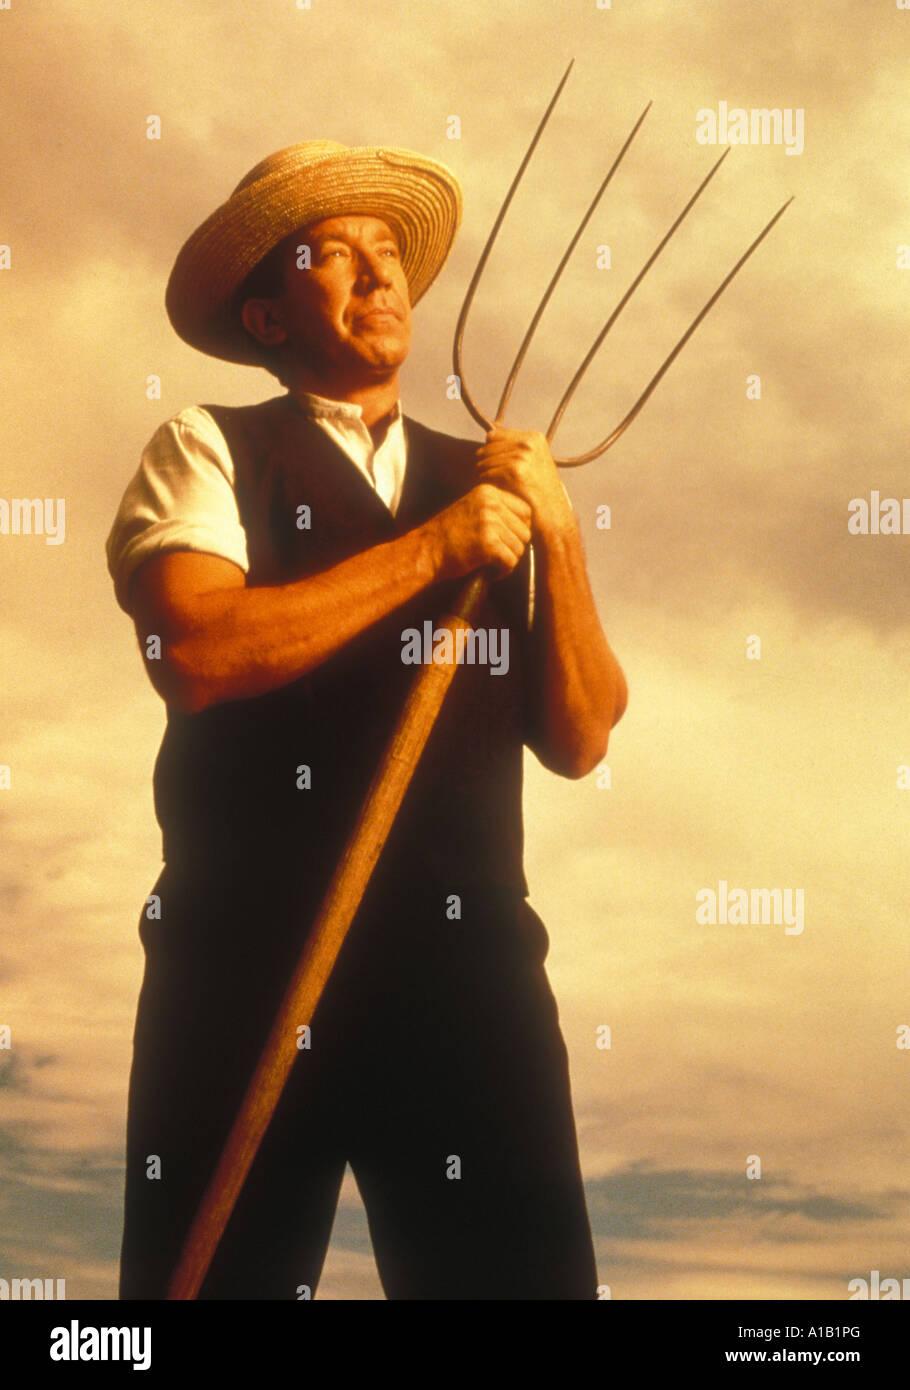 For Richer Or Poorer Year 1997 Director Bryan Spicer Tim Allen - Stock Image